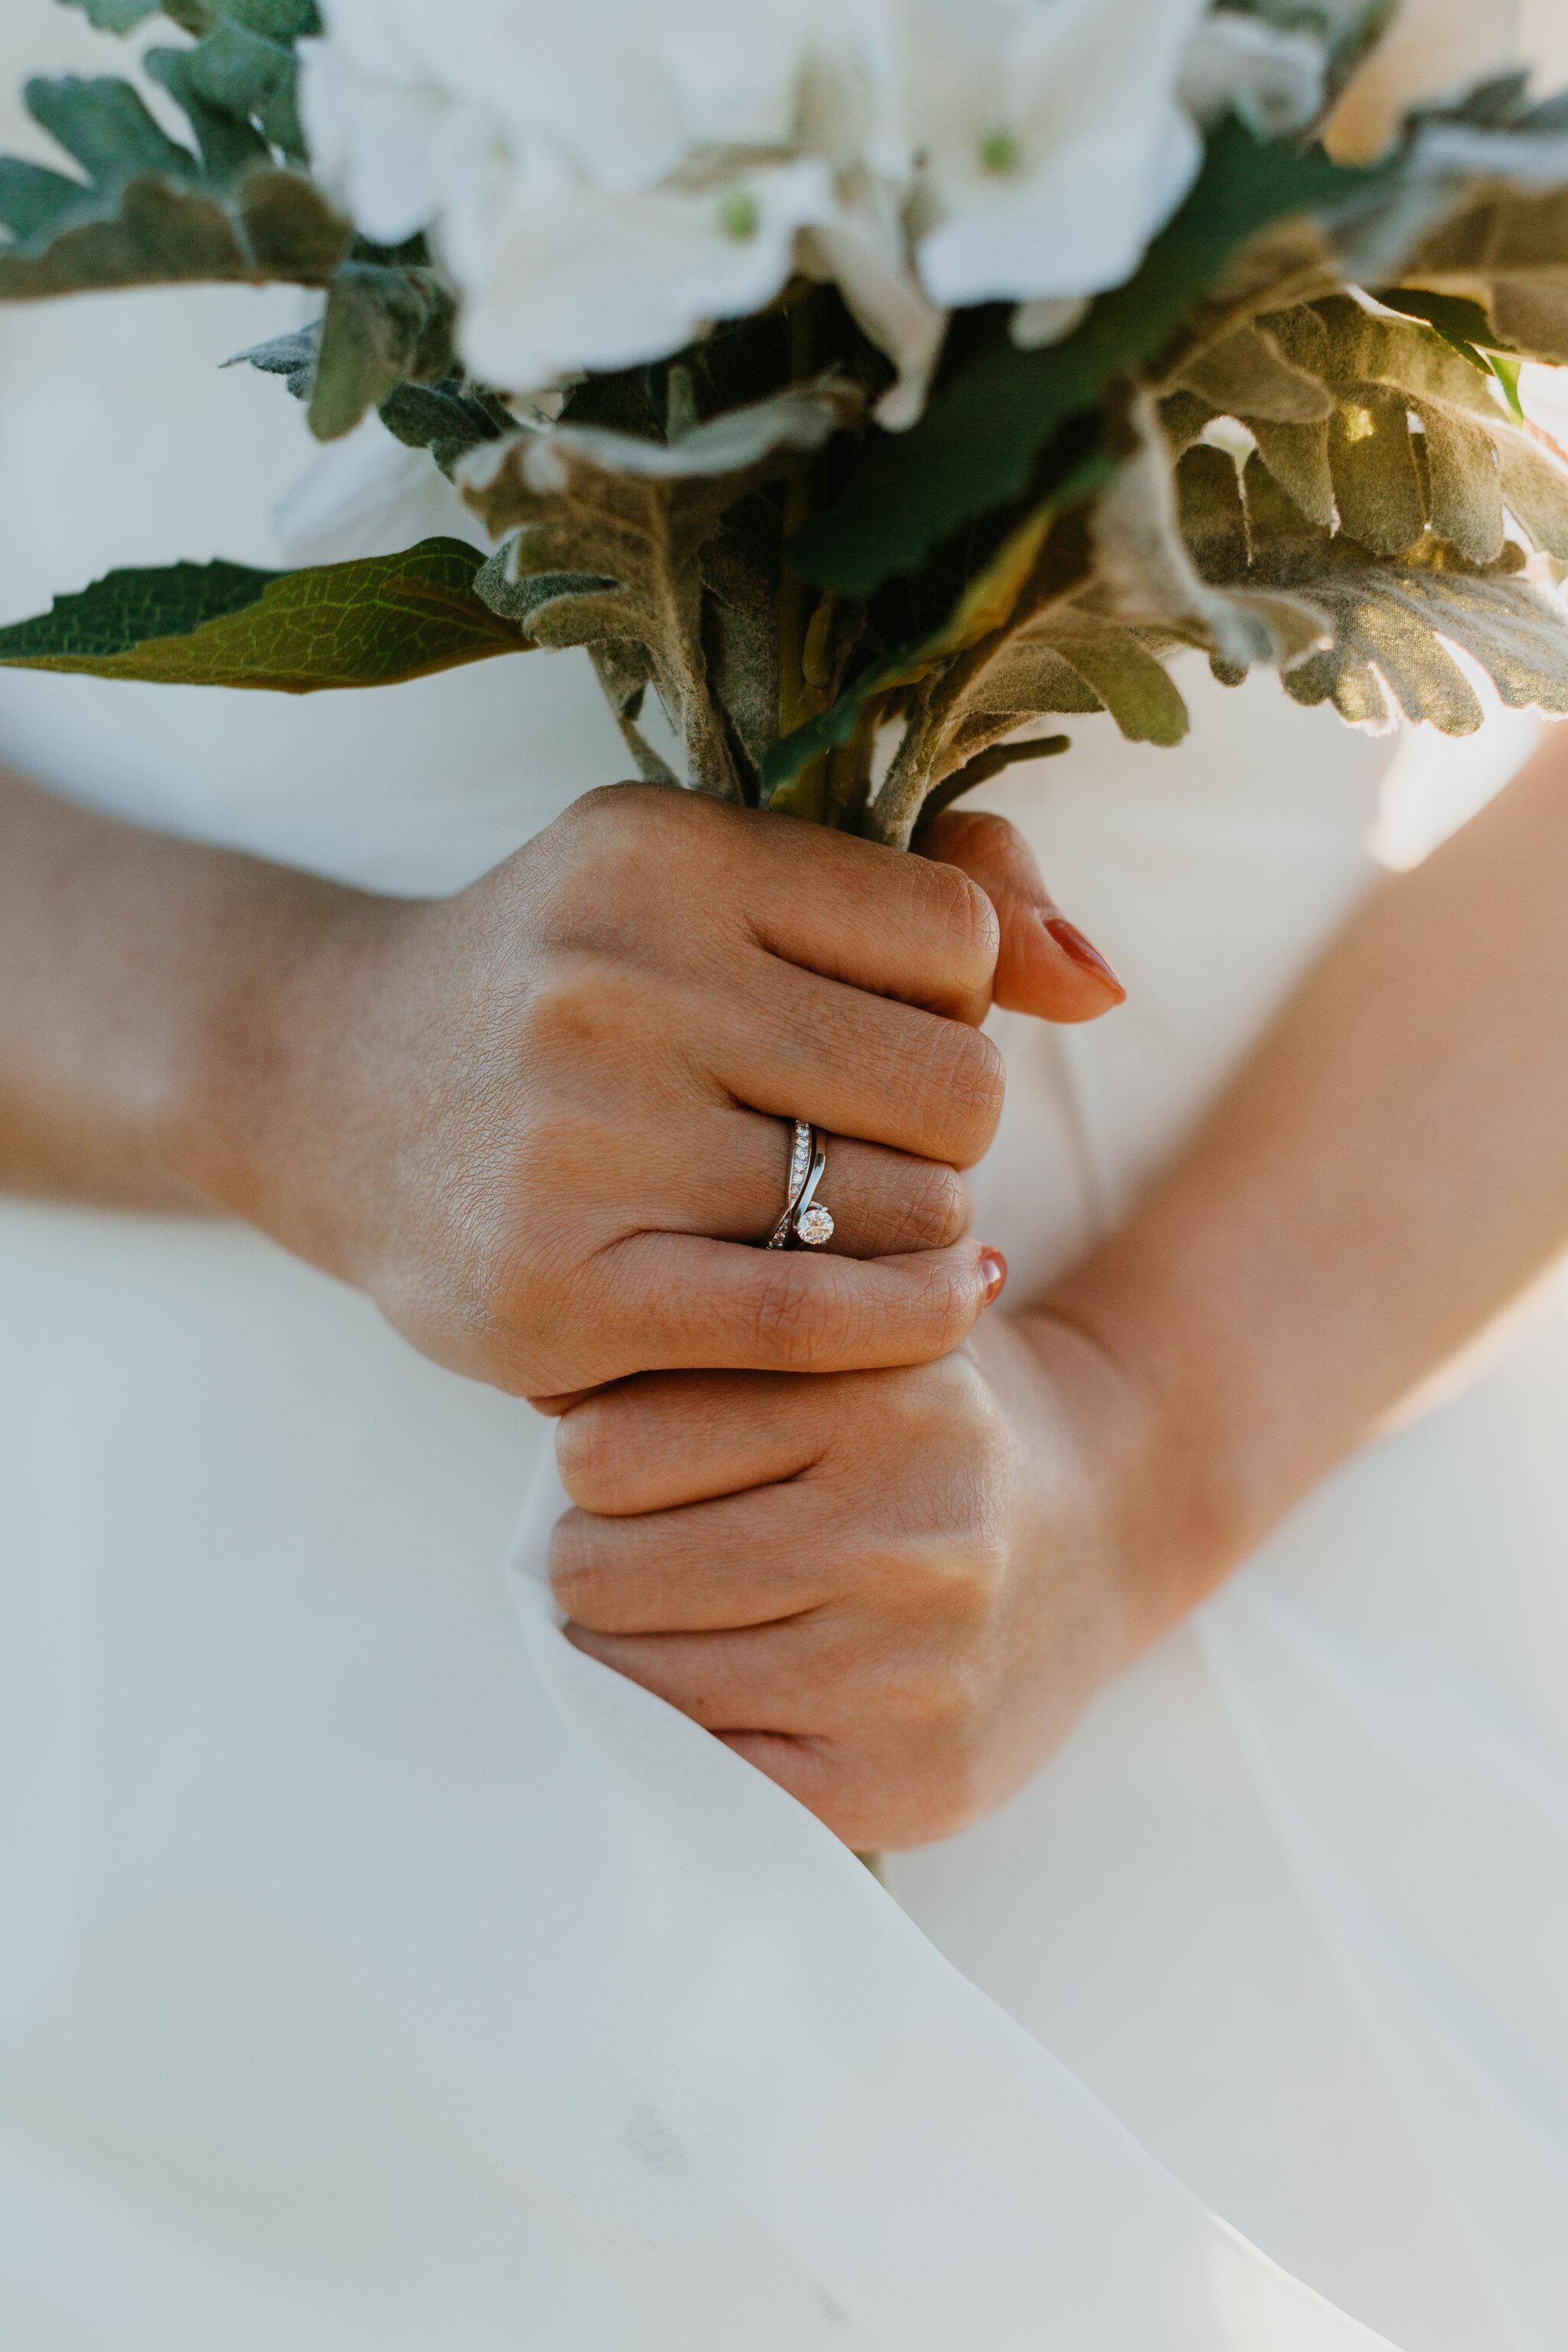 Maleny One Tree Hill Wedding - Maleny Wedding Photographer-6.jpg